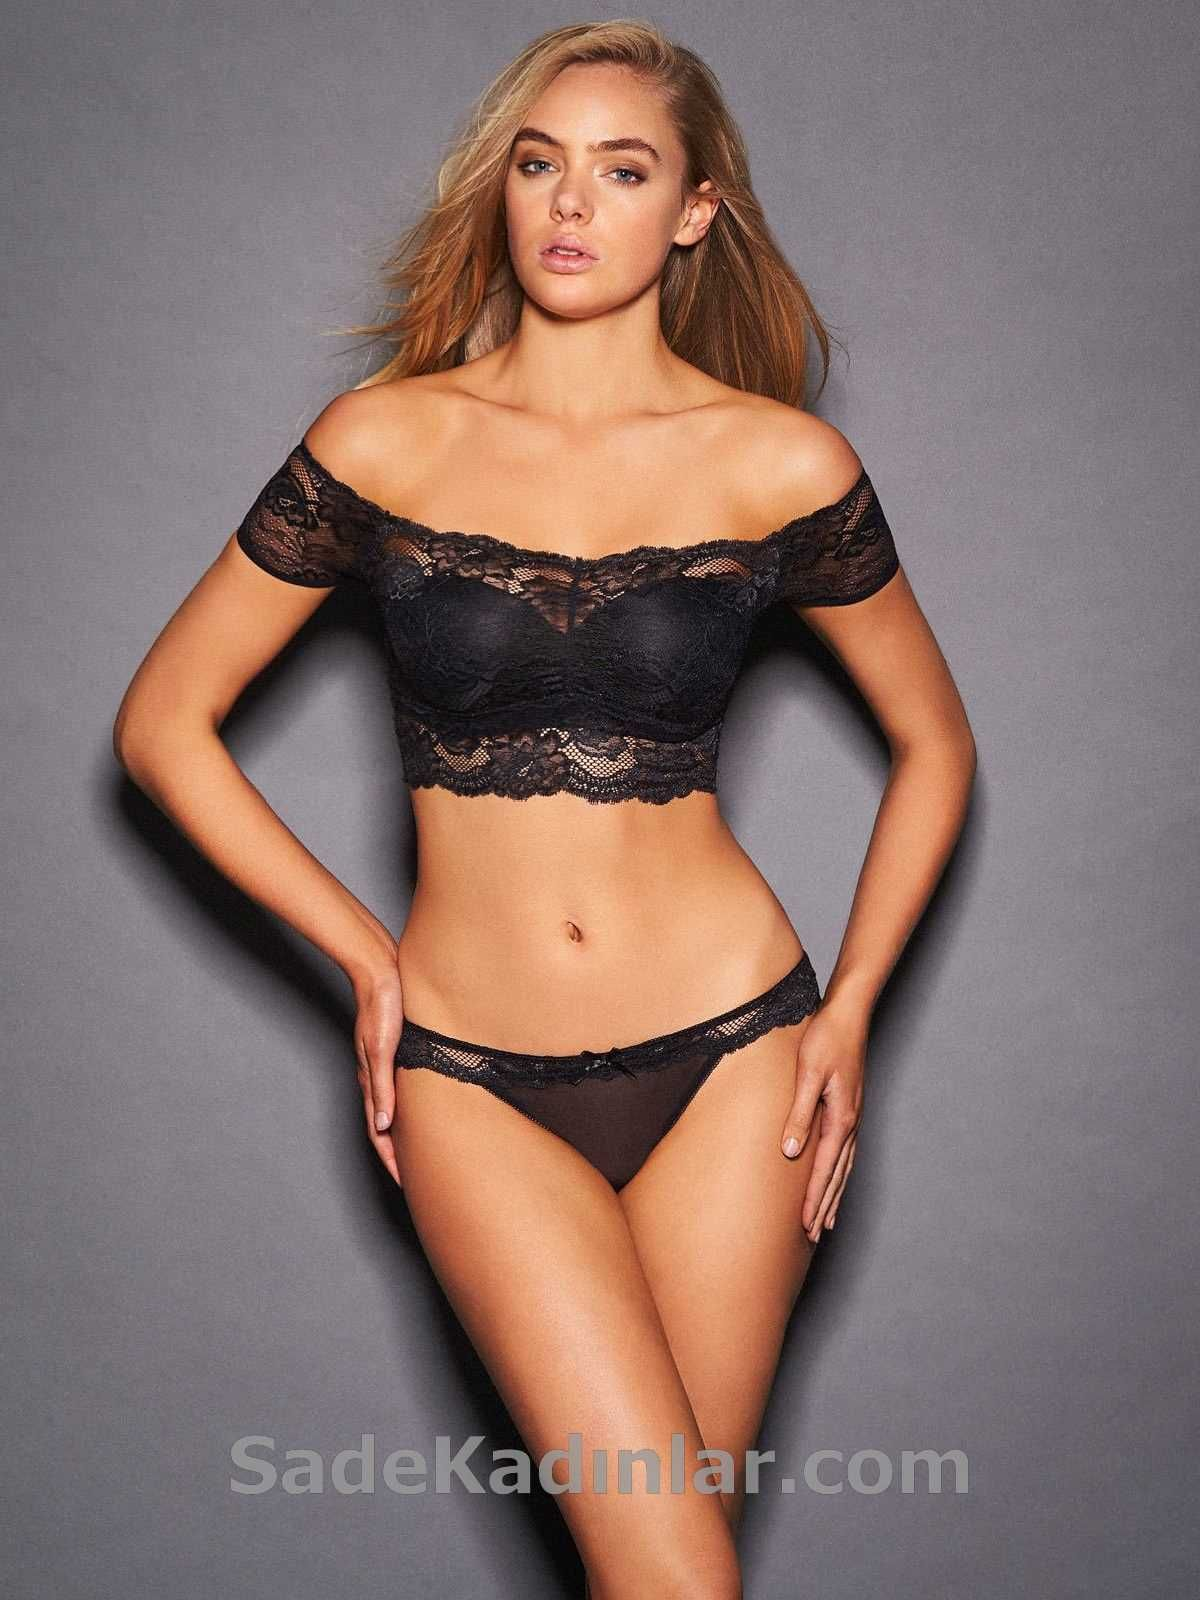 Bayan Ic Giyim Modelleri Siyah Gupur Dantel Askisiz Sutyen Kadin Ic Giyim Sac Bantlari